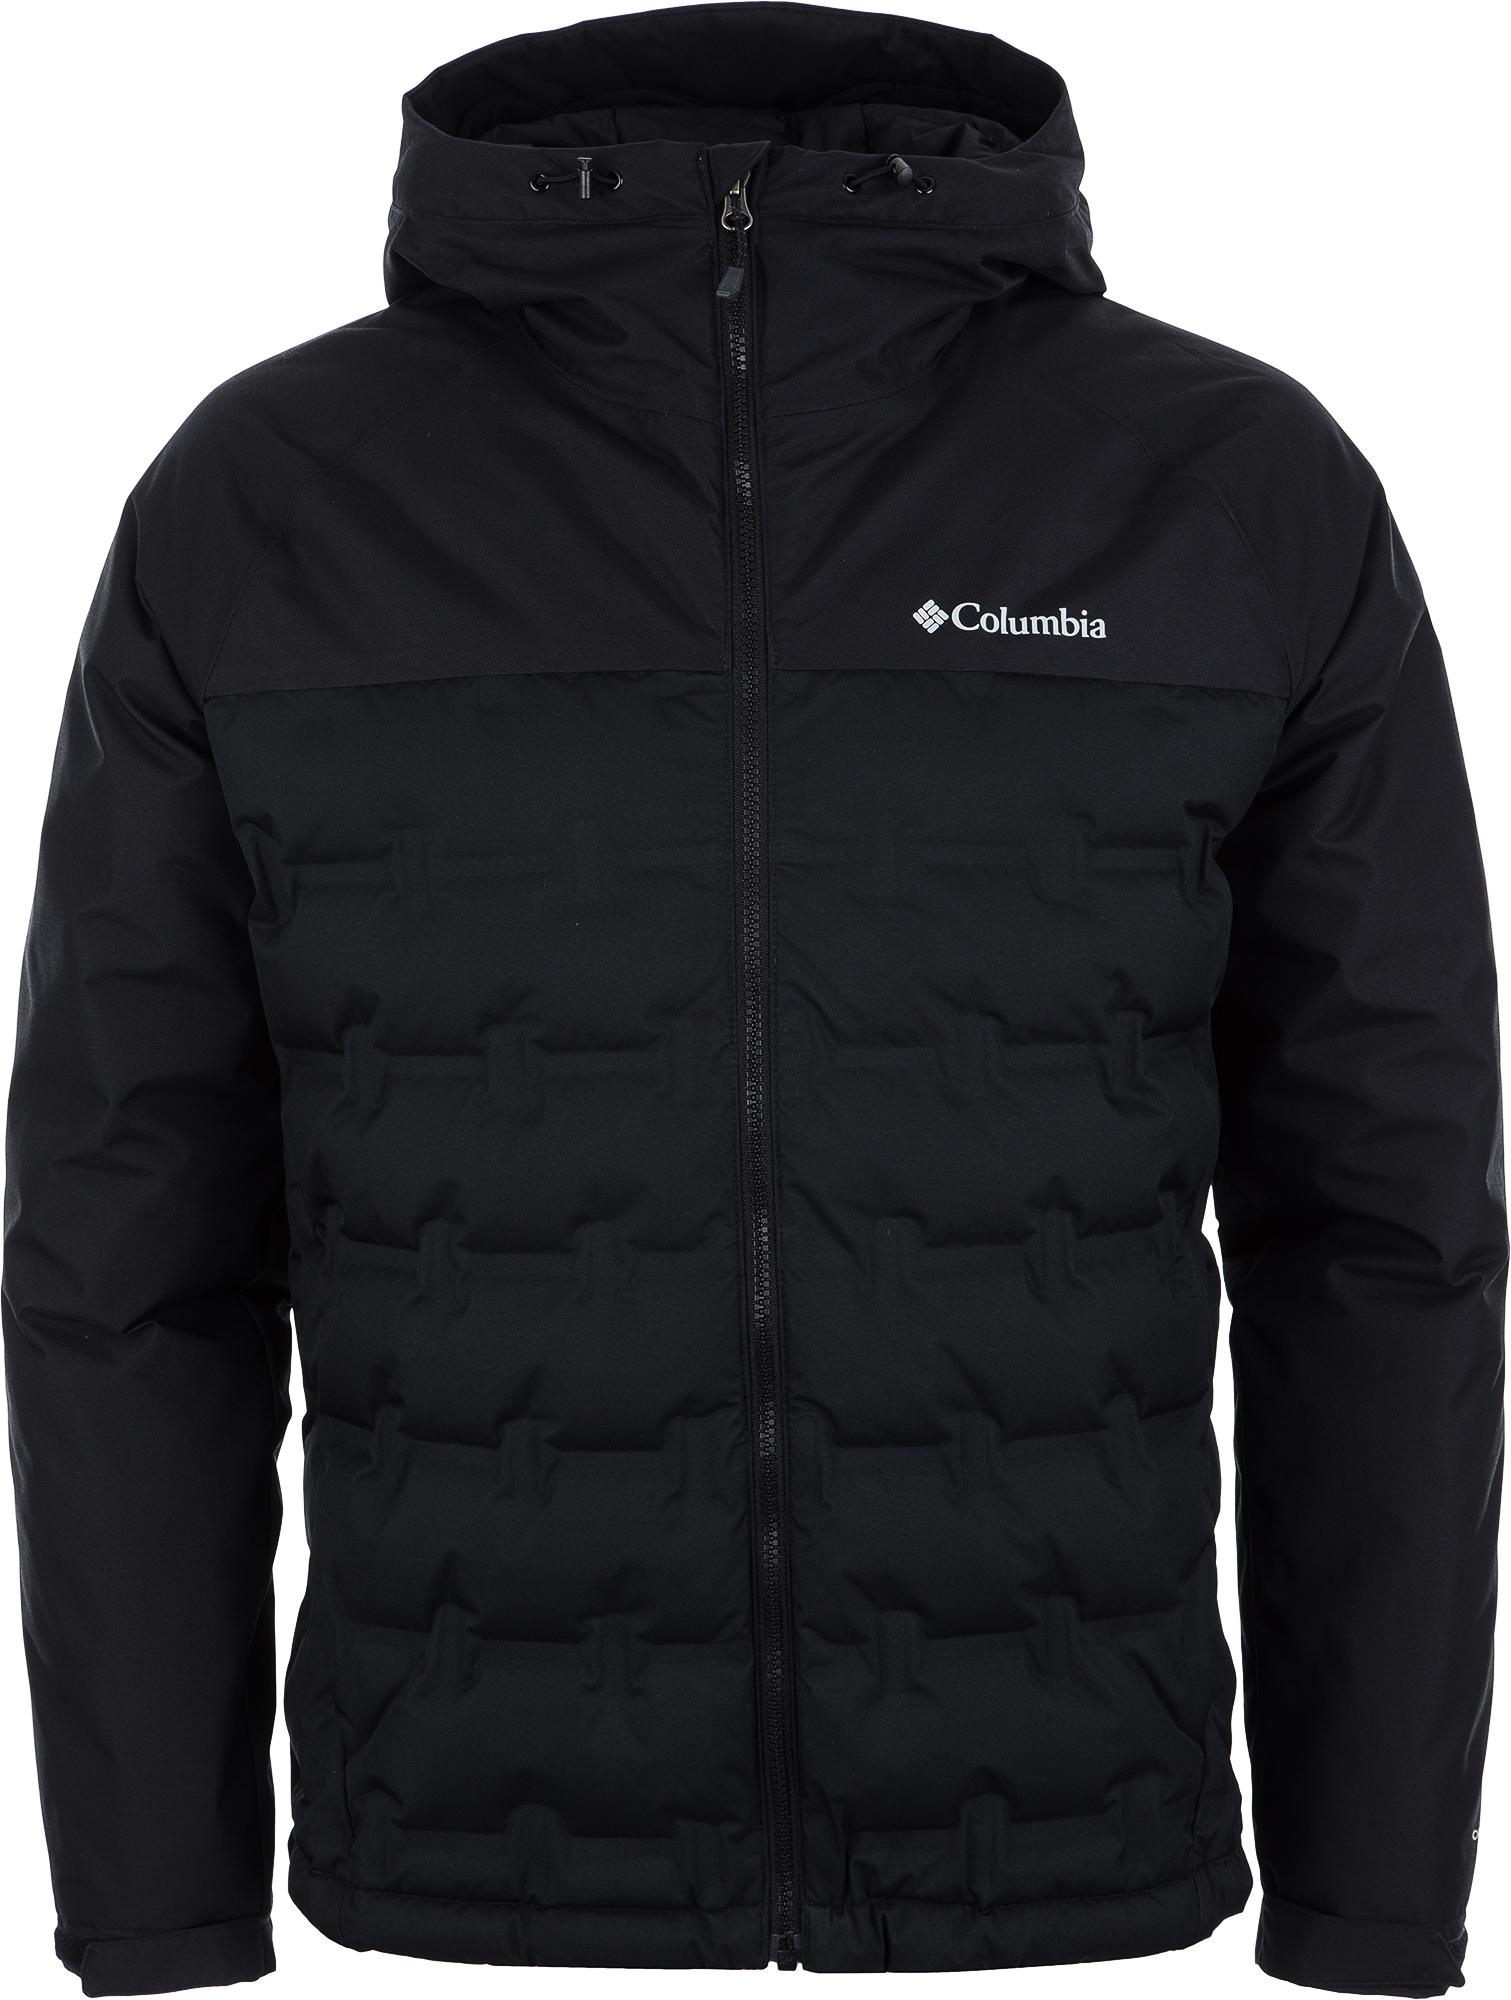 Columbia Куртка пуховая мужская Columbia Grand Trek, размер 56-58